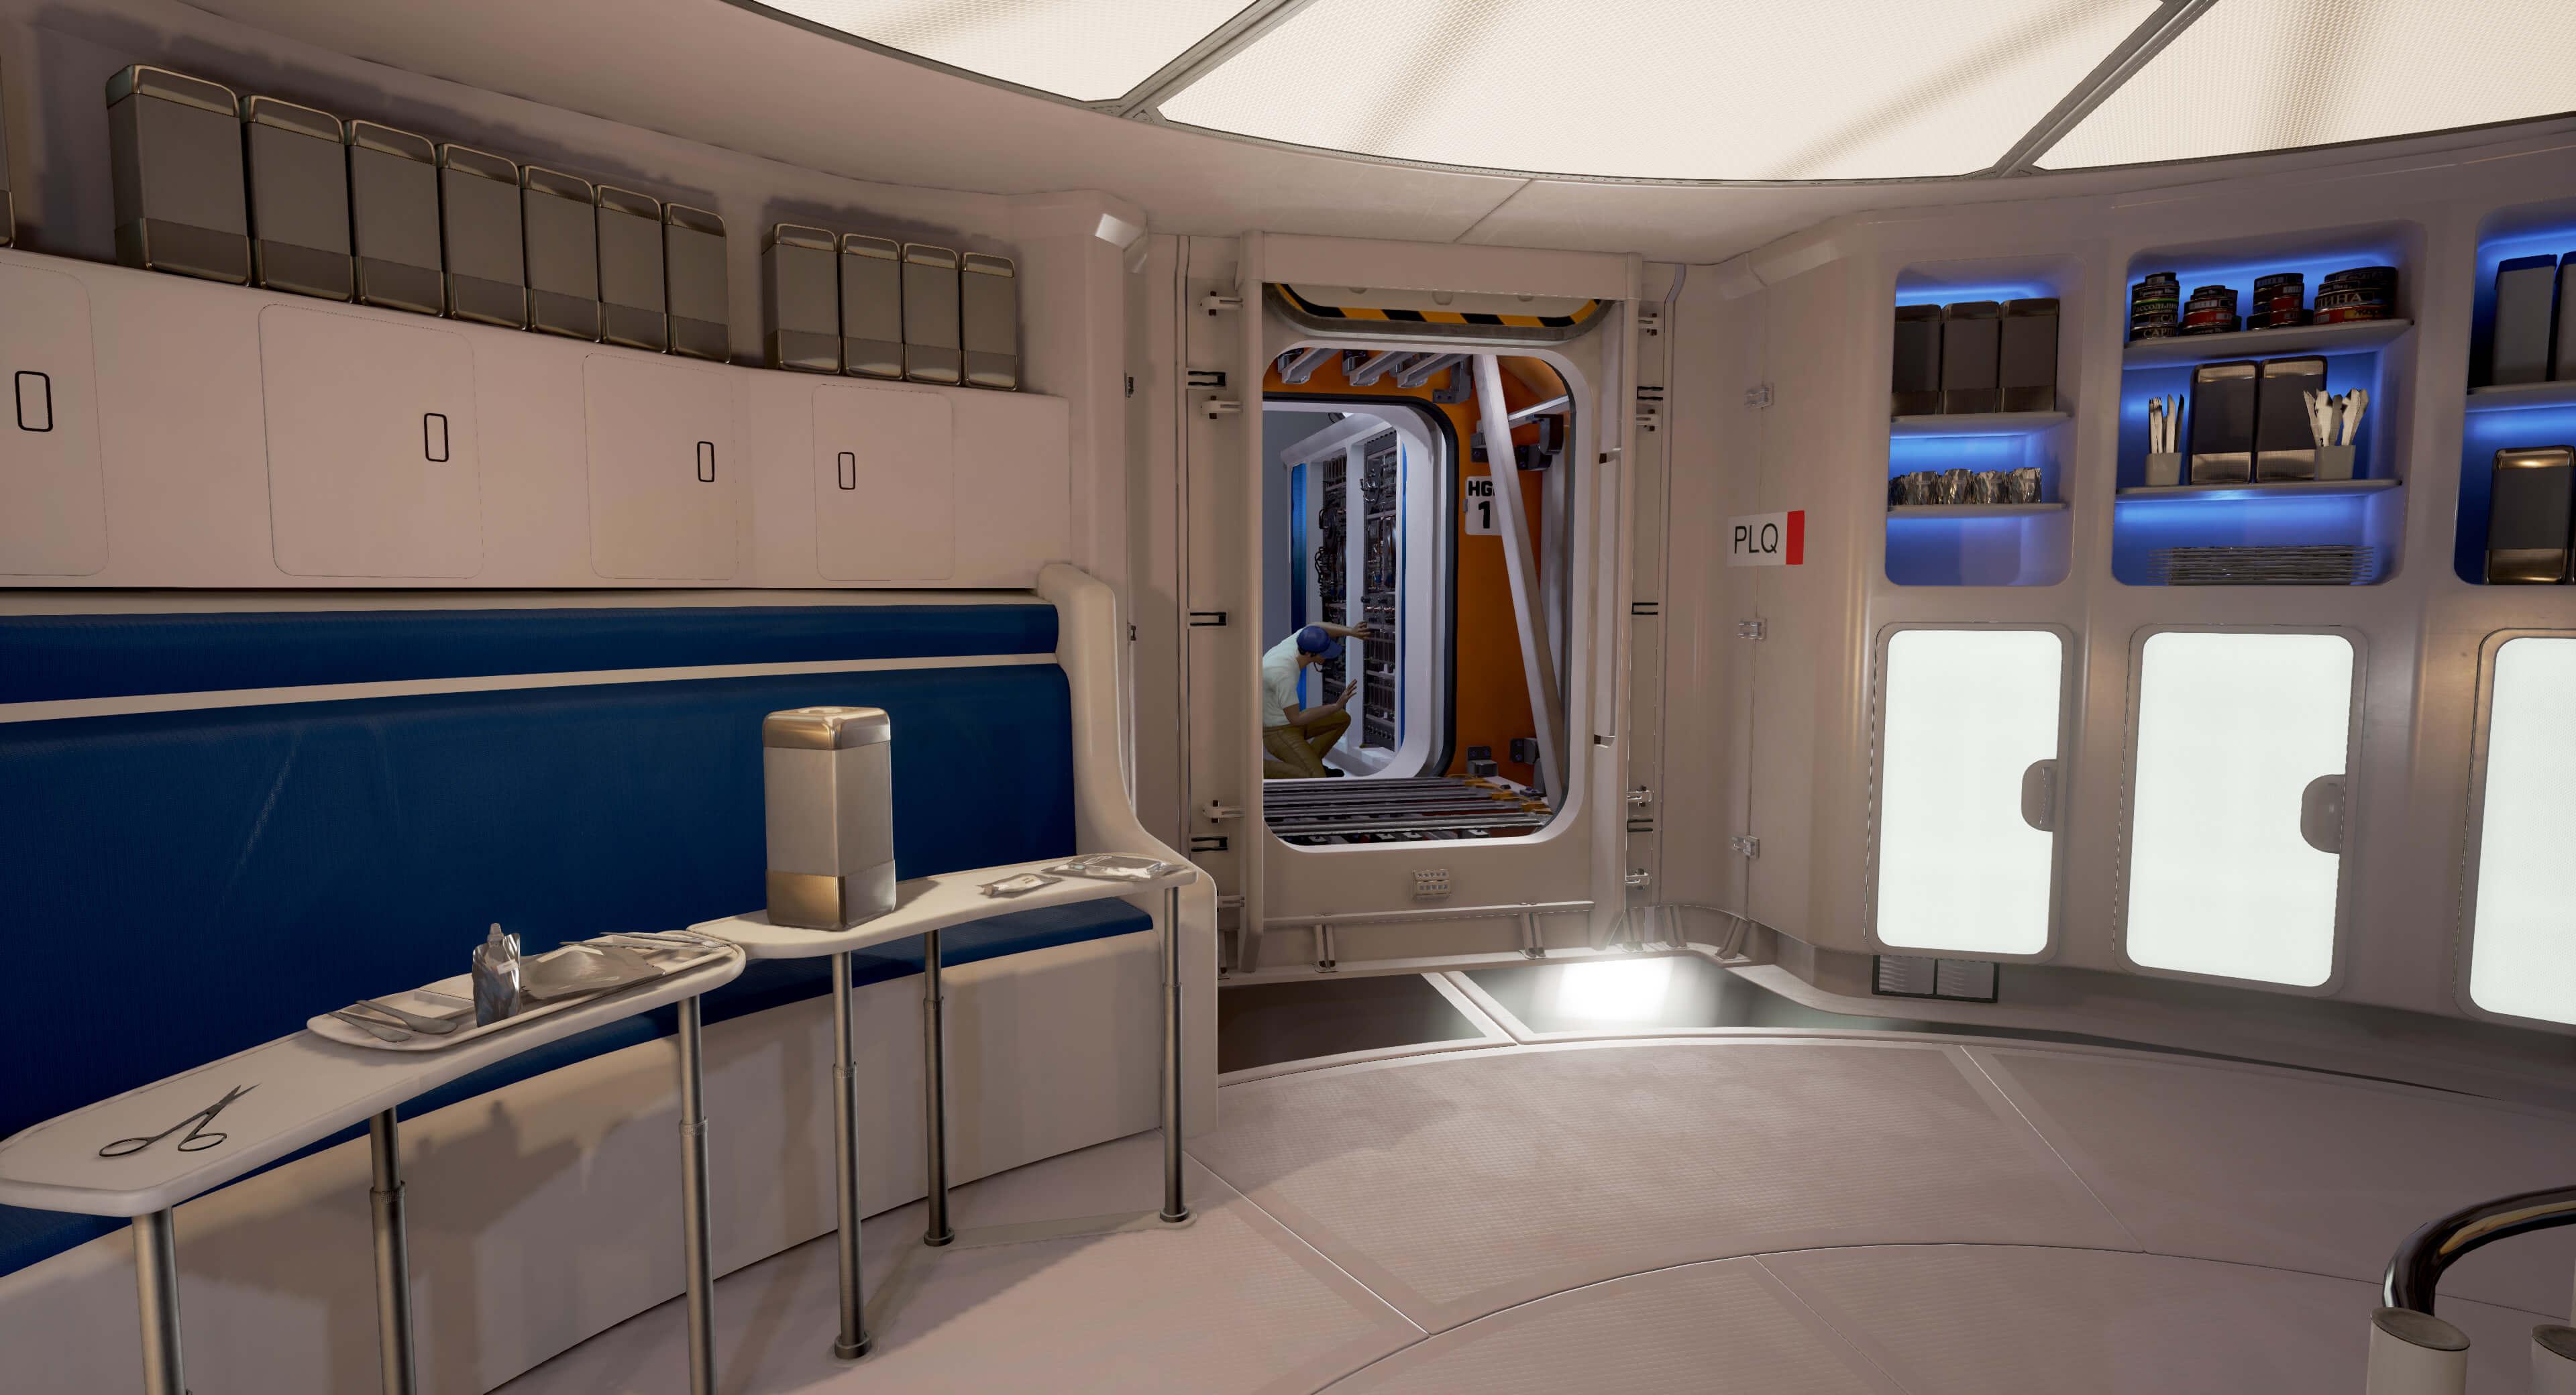 Mars 2030 Gallery 4